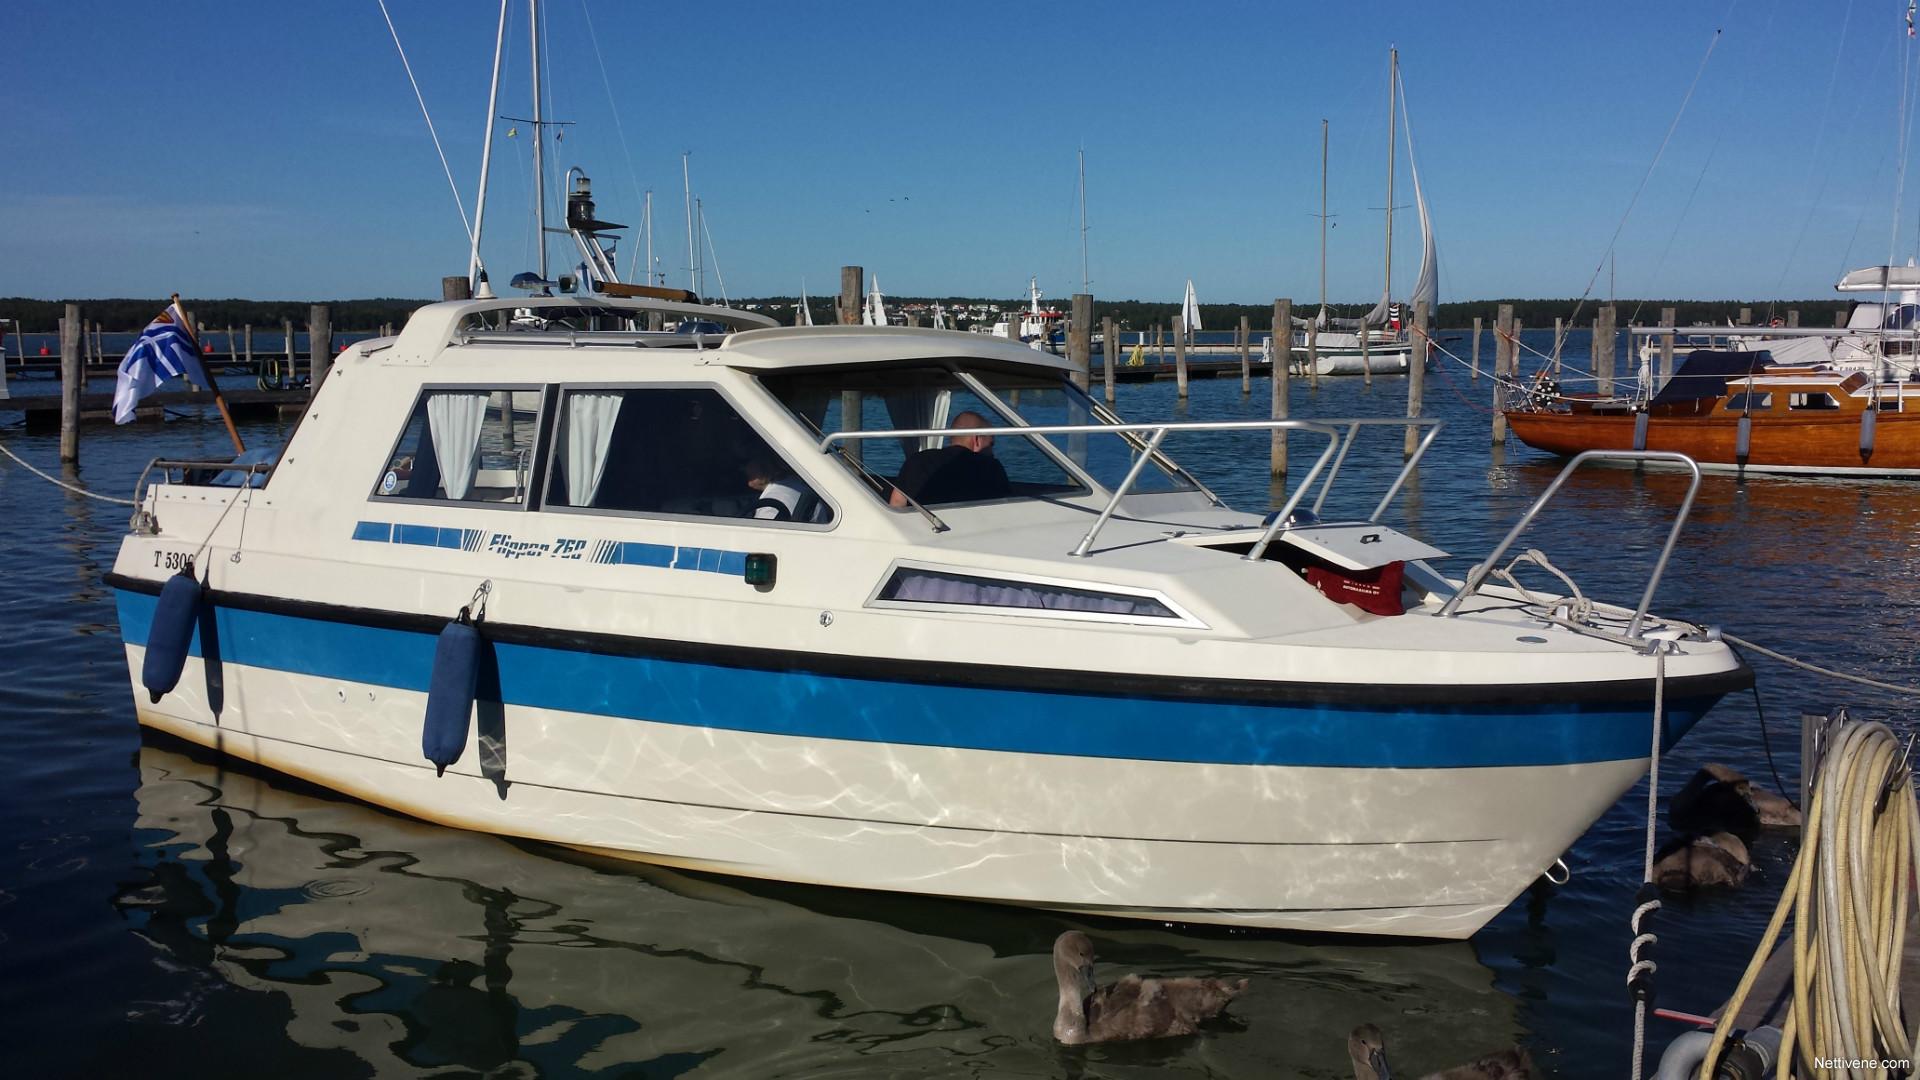 Flipper 760 Motor Boat Mietoinen Nettivene